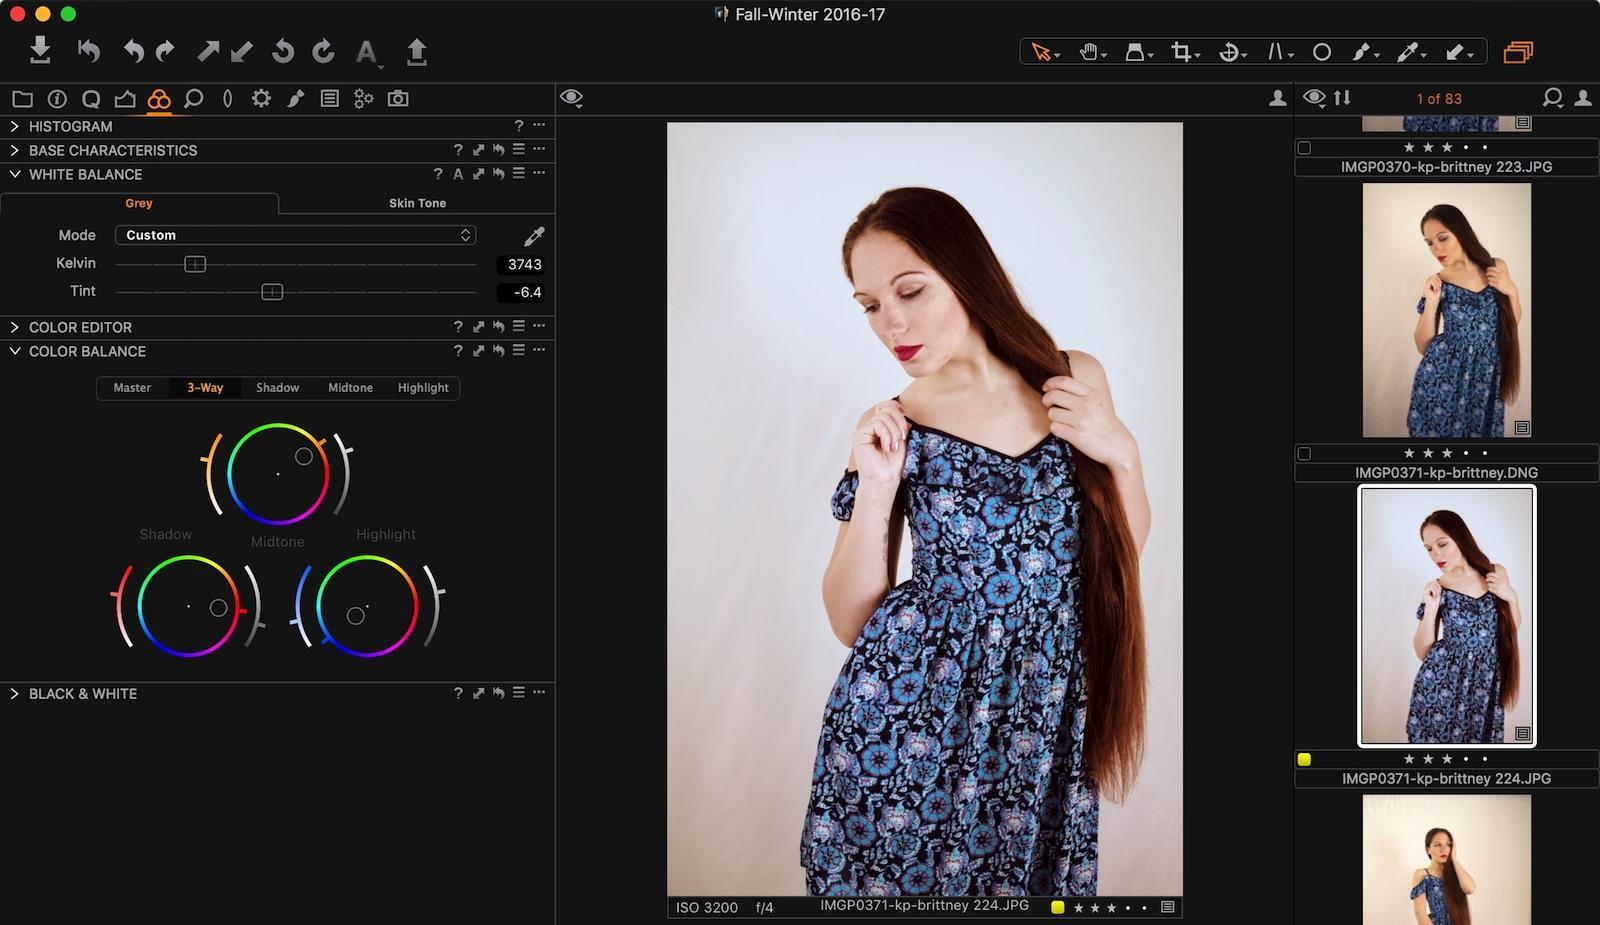 http://thedigitalstory.com/2017/03/15/color-adjust-with-cb.jpg